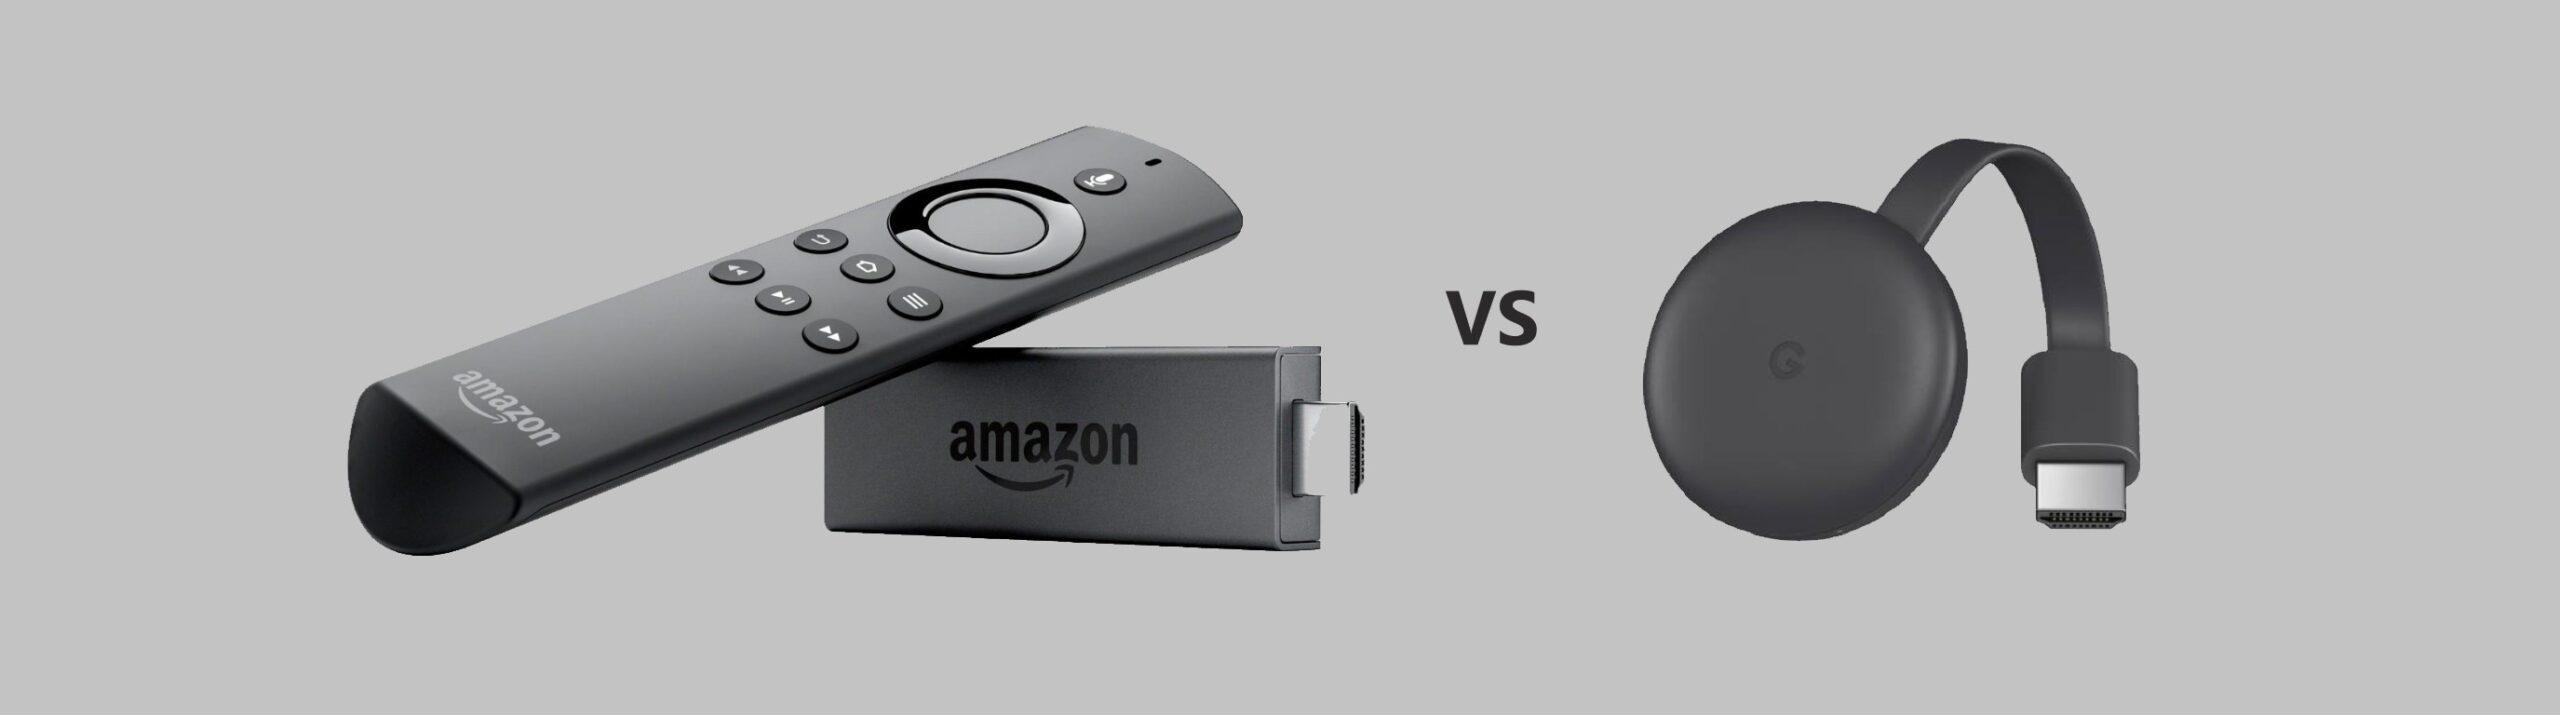 Chromecast vs Fire Stick Comparison